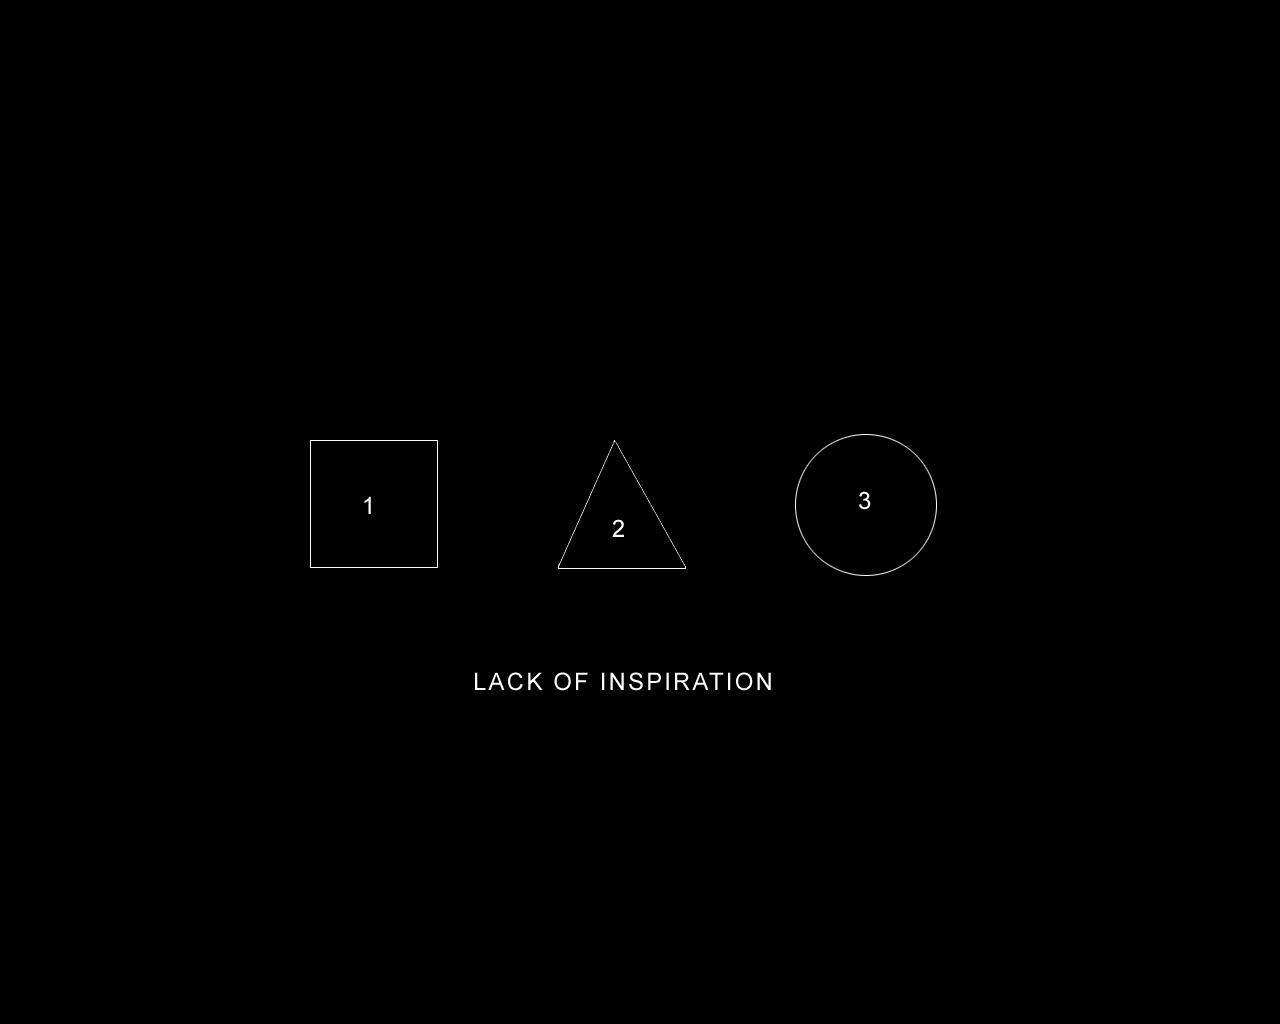 Lack of Inspiration by slabe